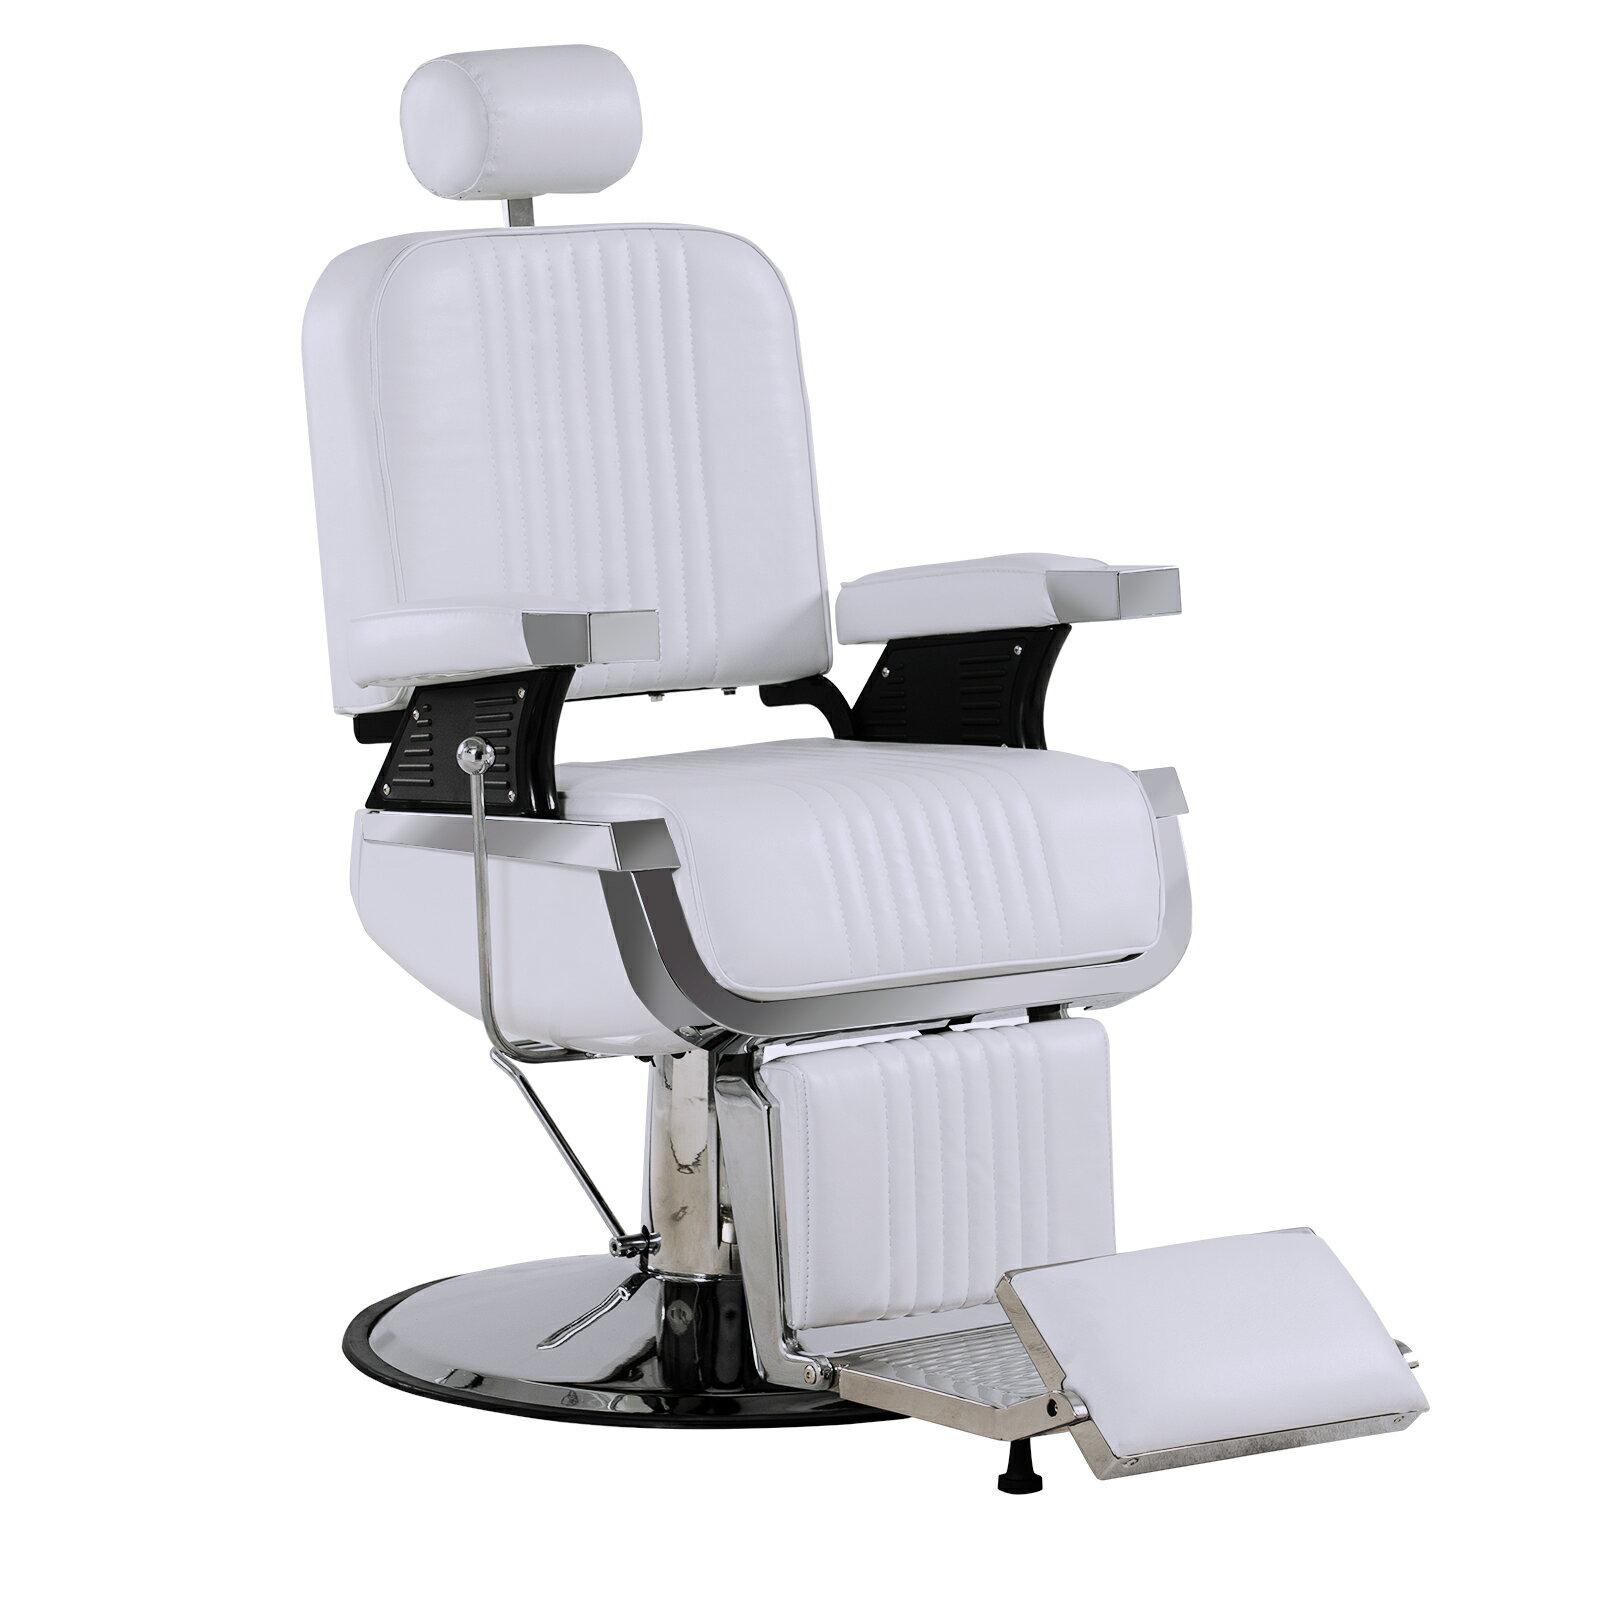 Outstanding Barberpub Barber Chair Heavy Duty Hydraulic Recliner Salon Spa Beauty Equipment Lamtechconsult Wood Chair Design Ideas Lamtechconsultcom